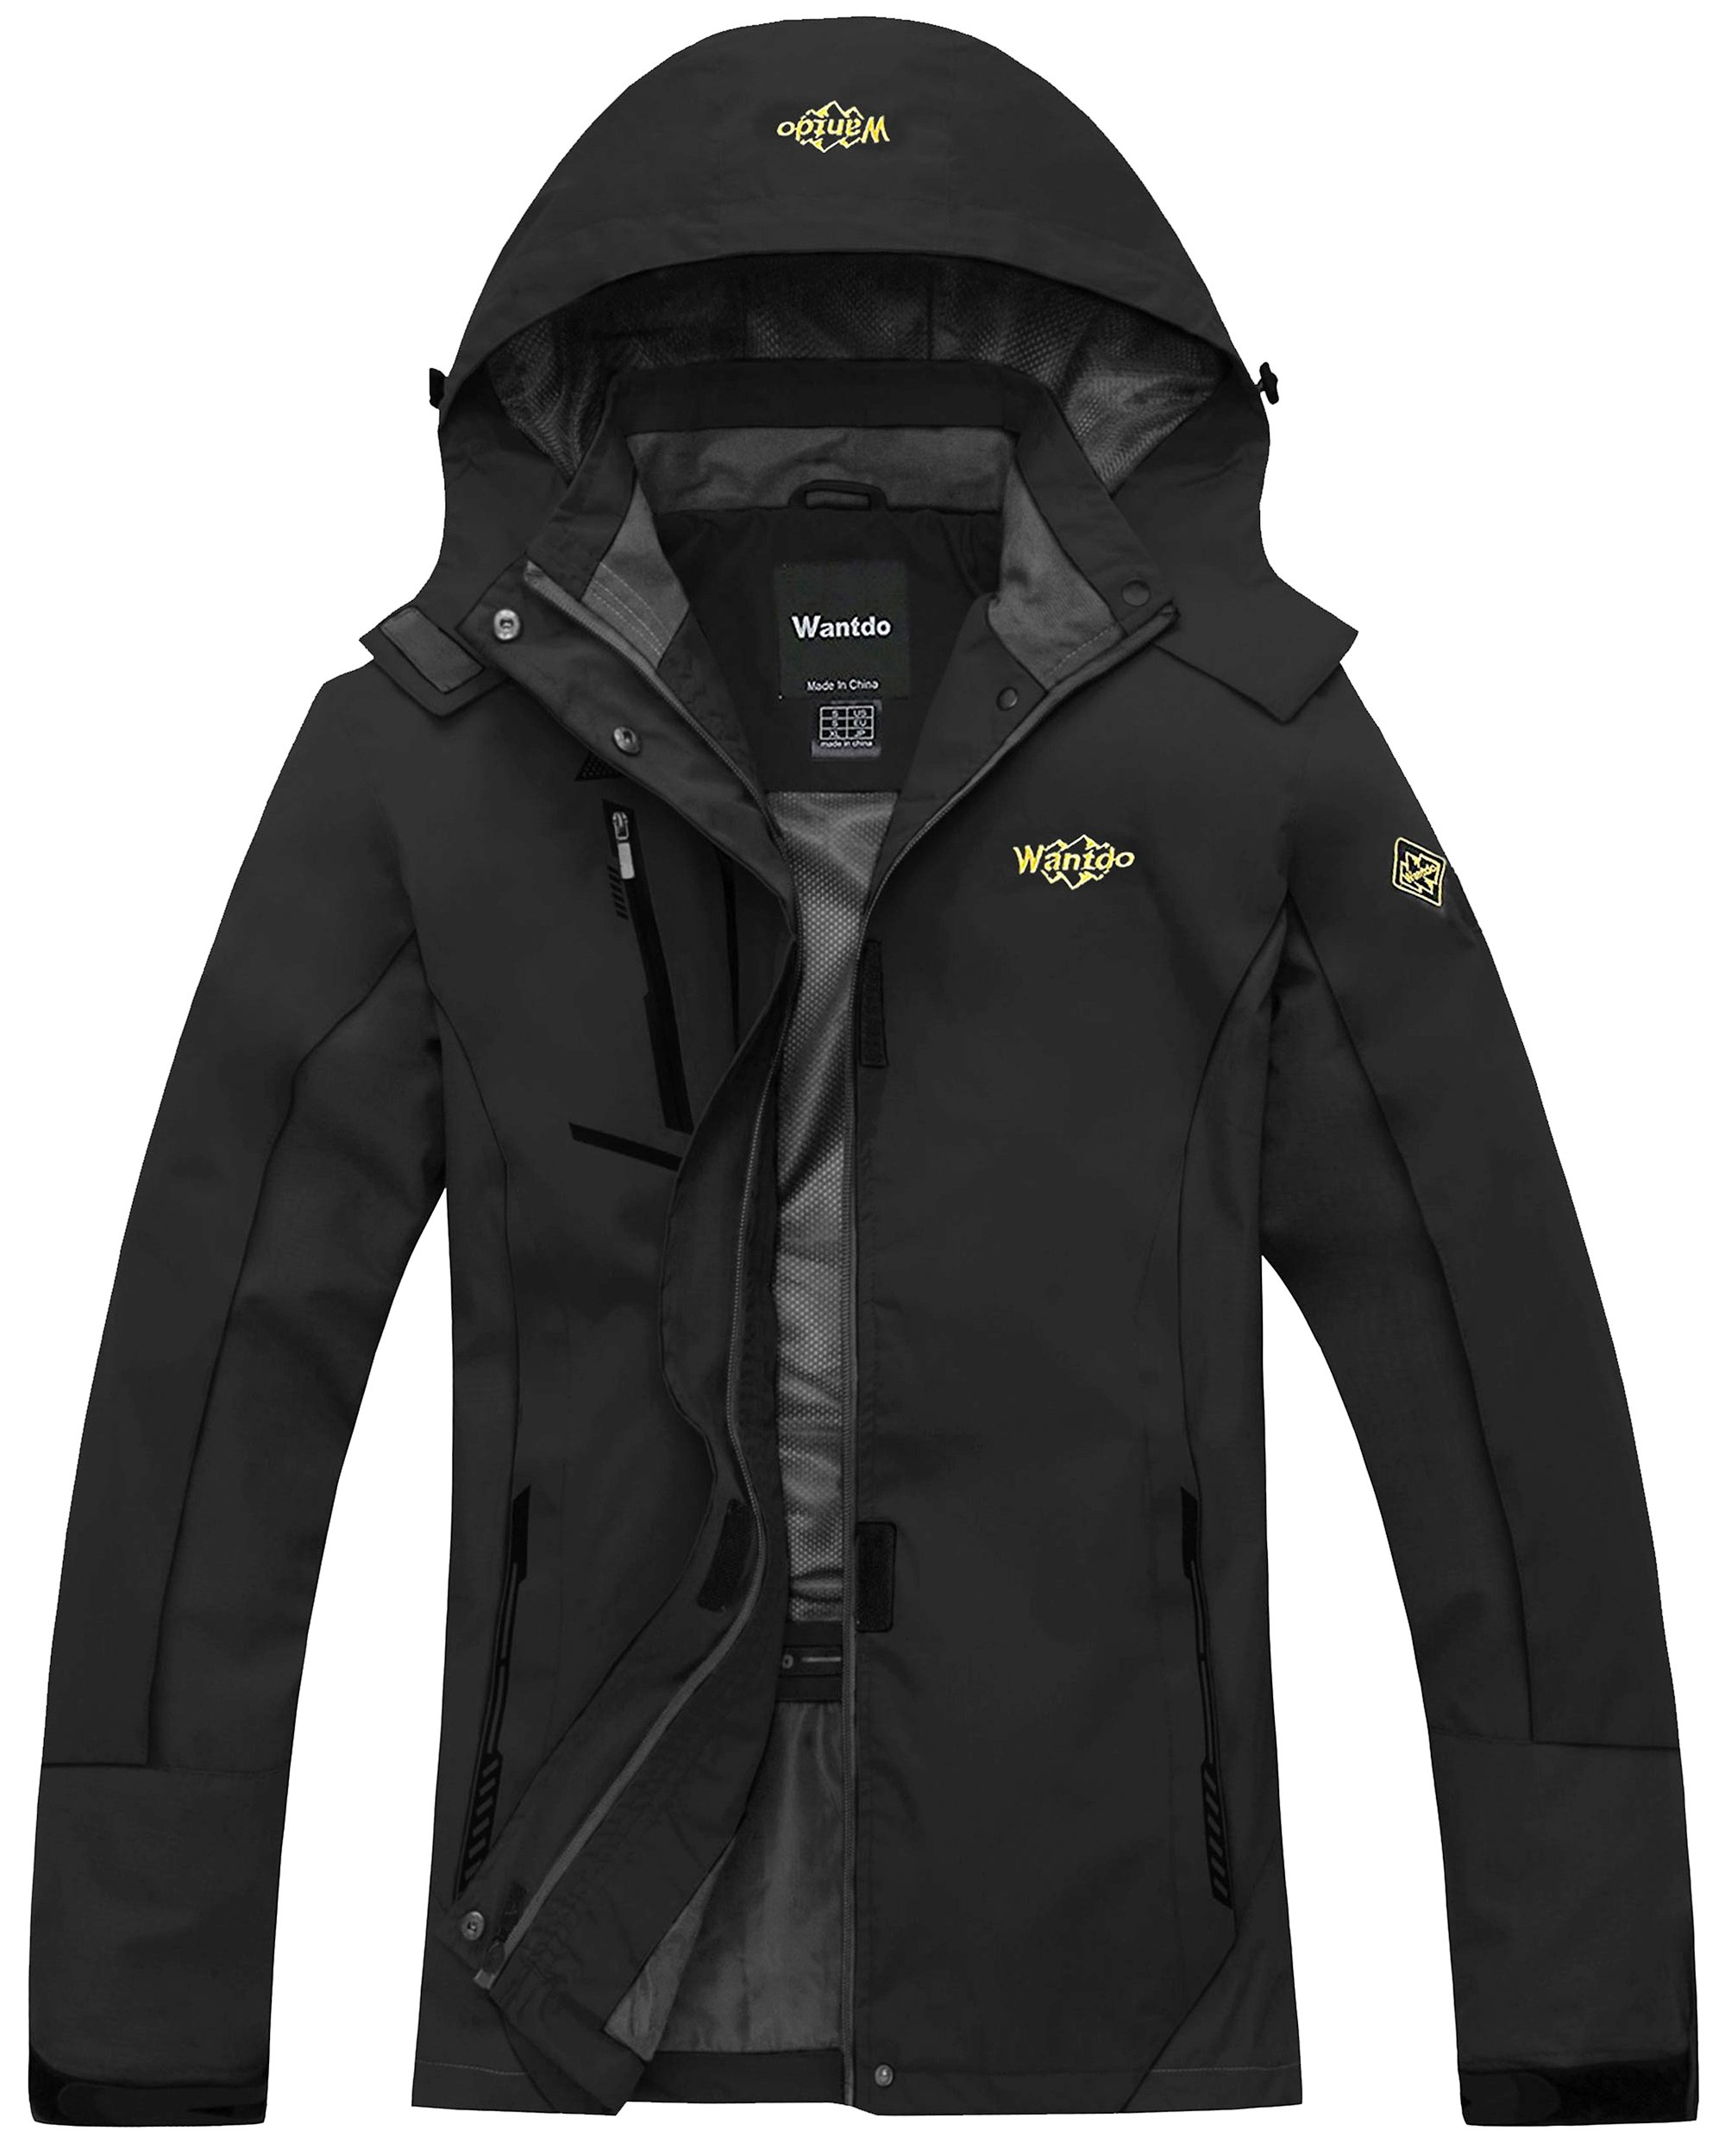 Wantdo Women's Windproof Breathable Jacket Athletes & Outdoor Sportswear,Medium,Black